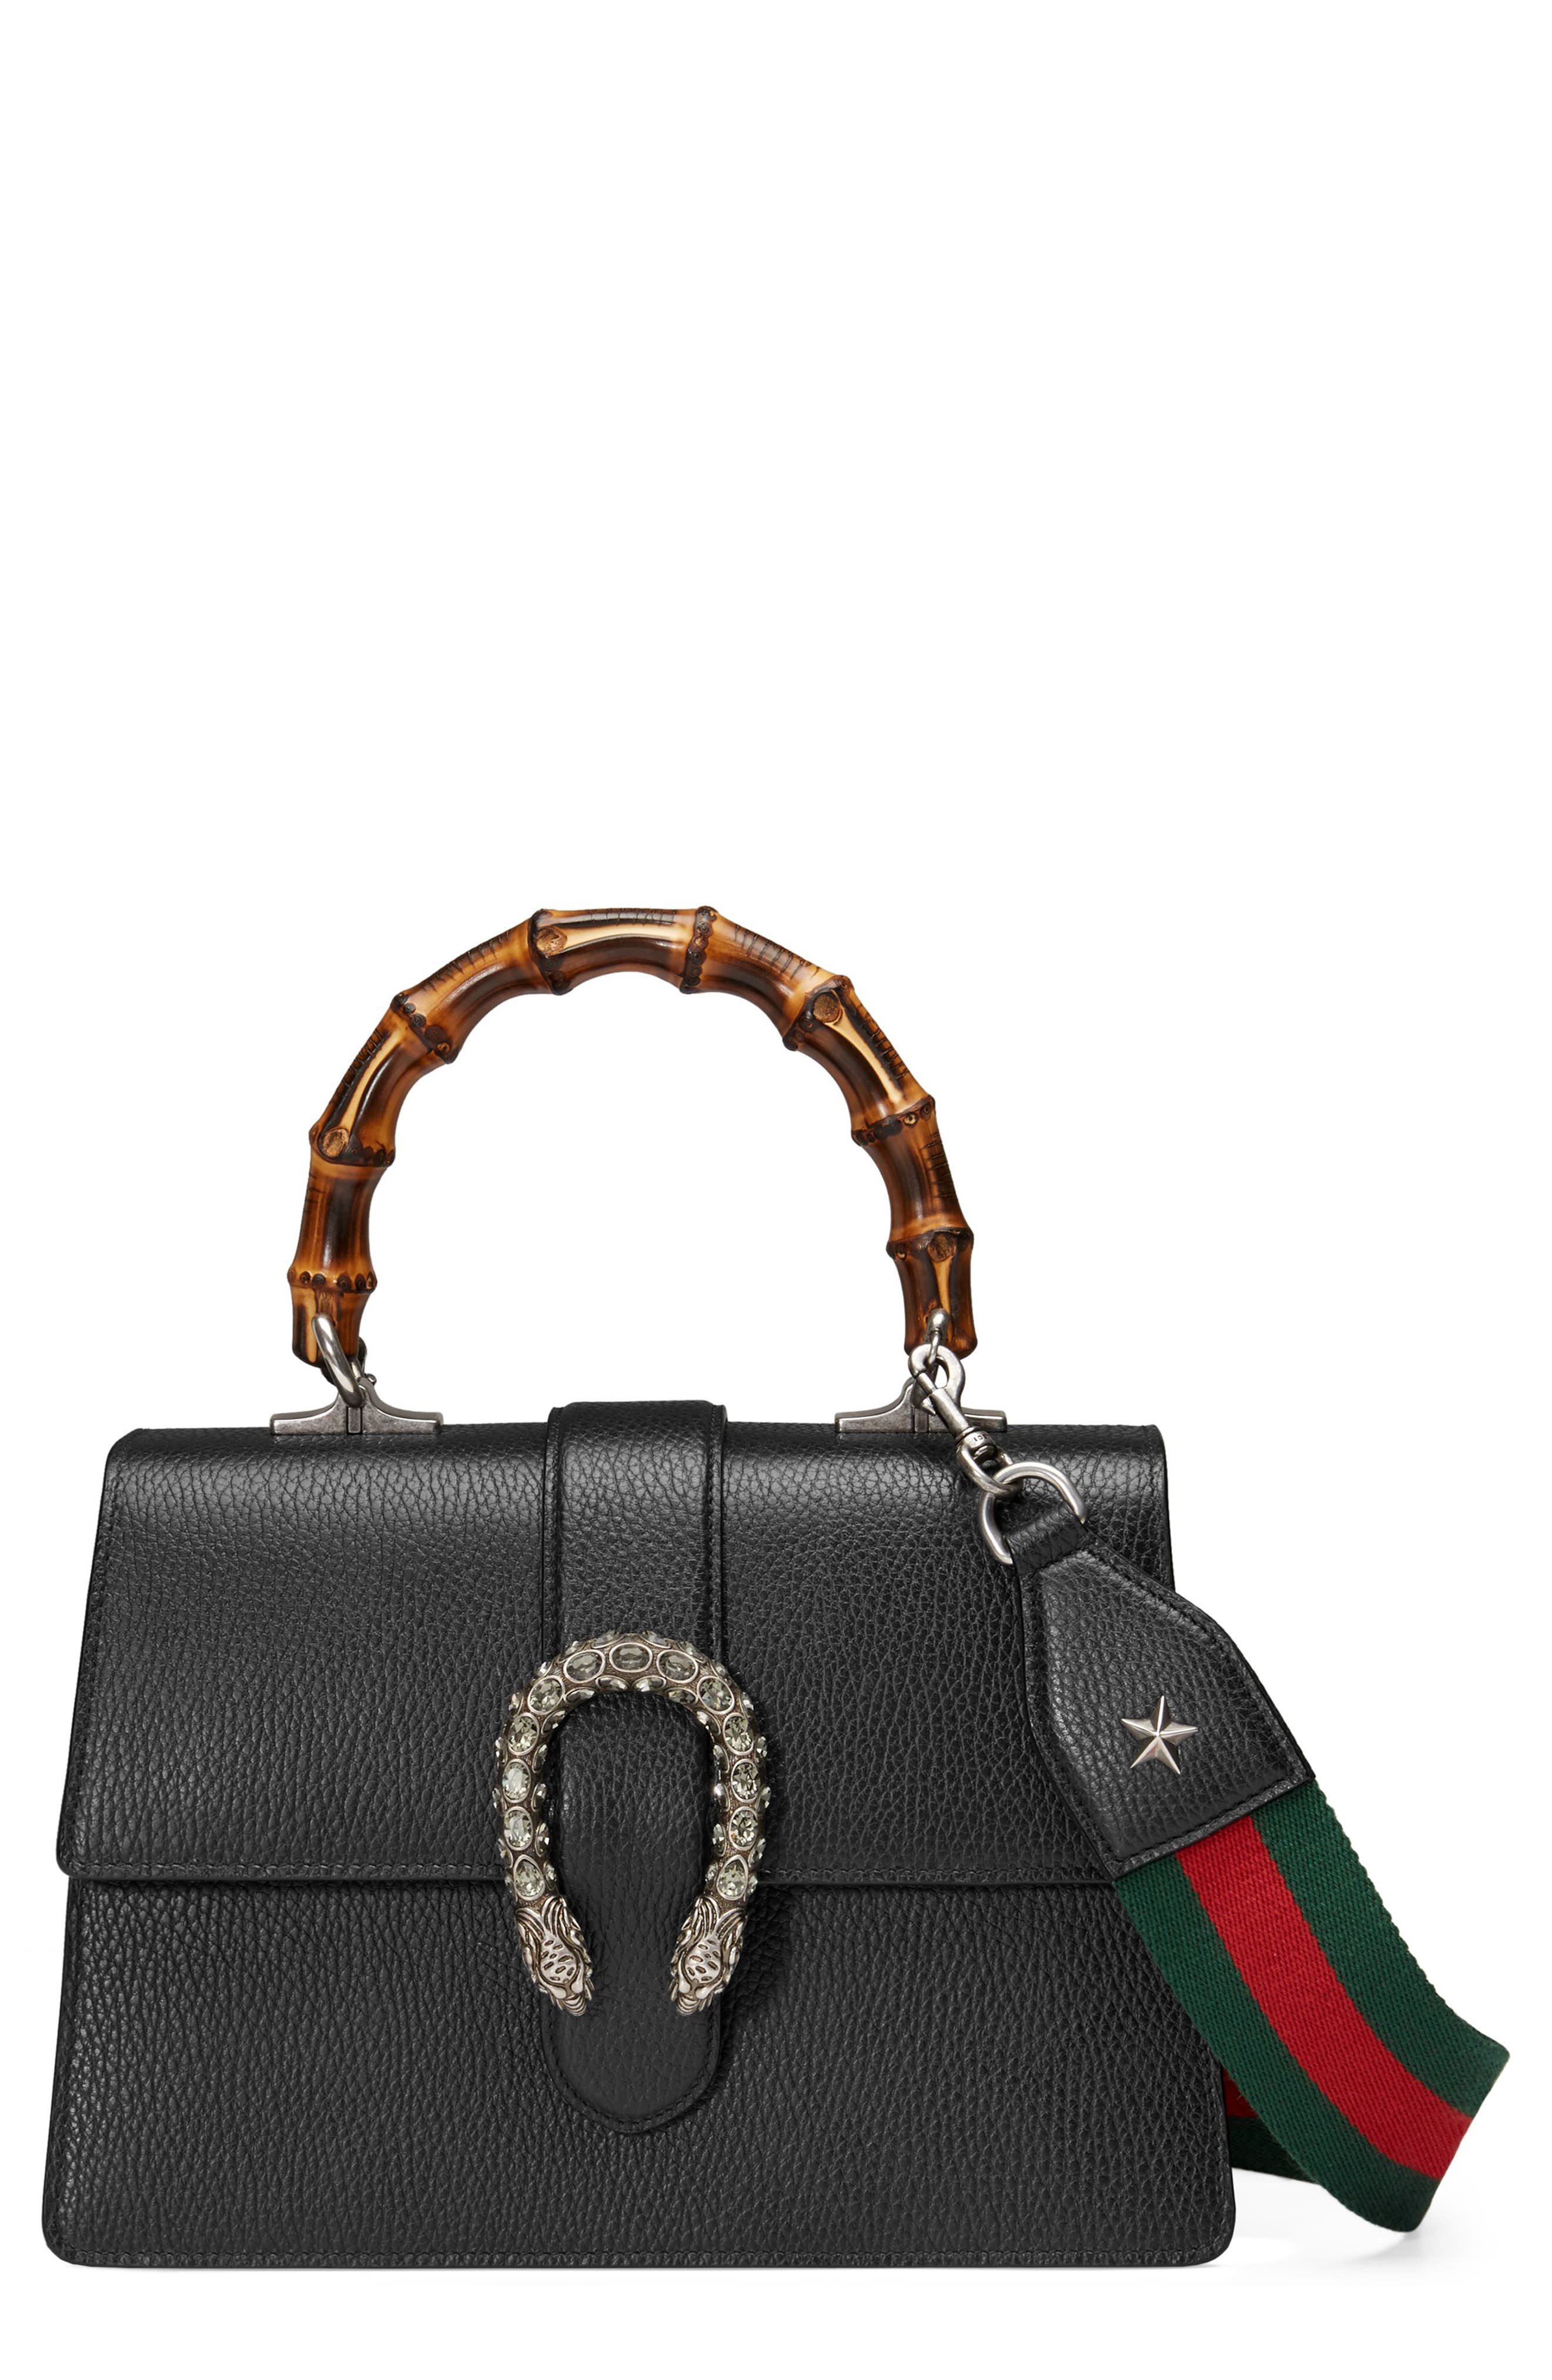 GUCCI, Medium Dionysus Leather Top Handle Satchel, Main thumbnail 1, color, NERO/ VRV/ BLACK DIAMOND